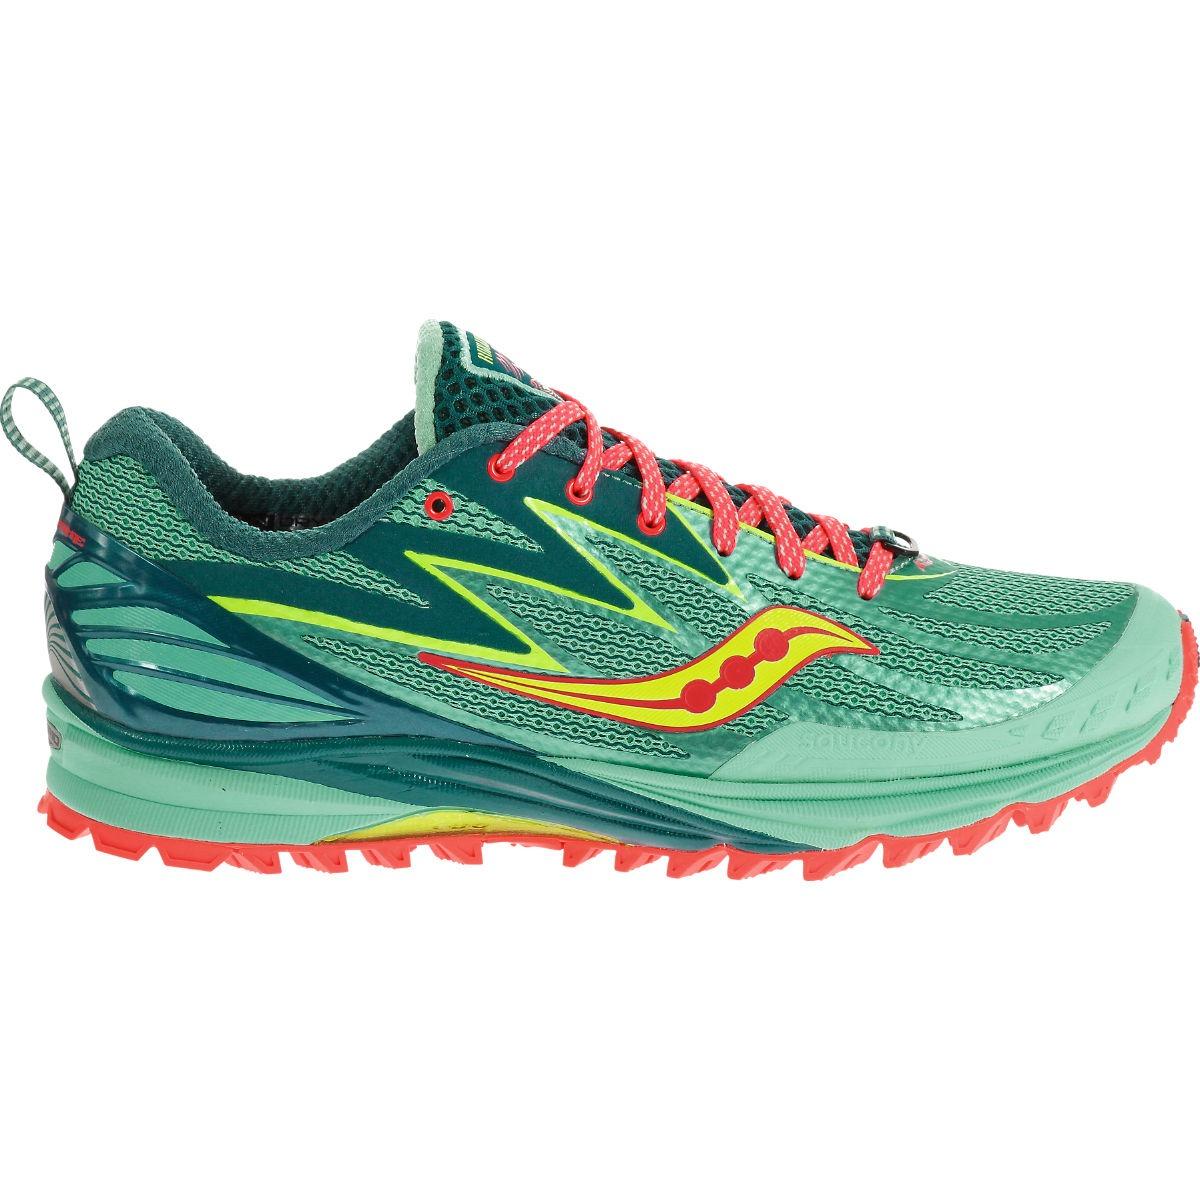 410edd533177 Saucony Peregrine 5 Women s Trail running Shoe – Coventry Runner